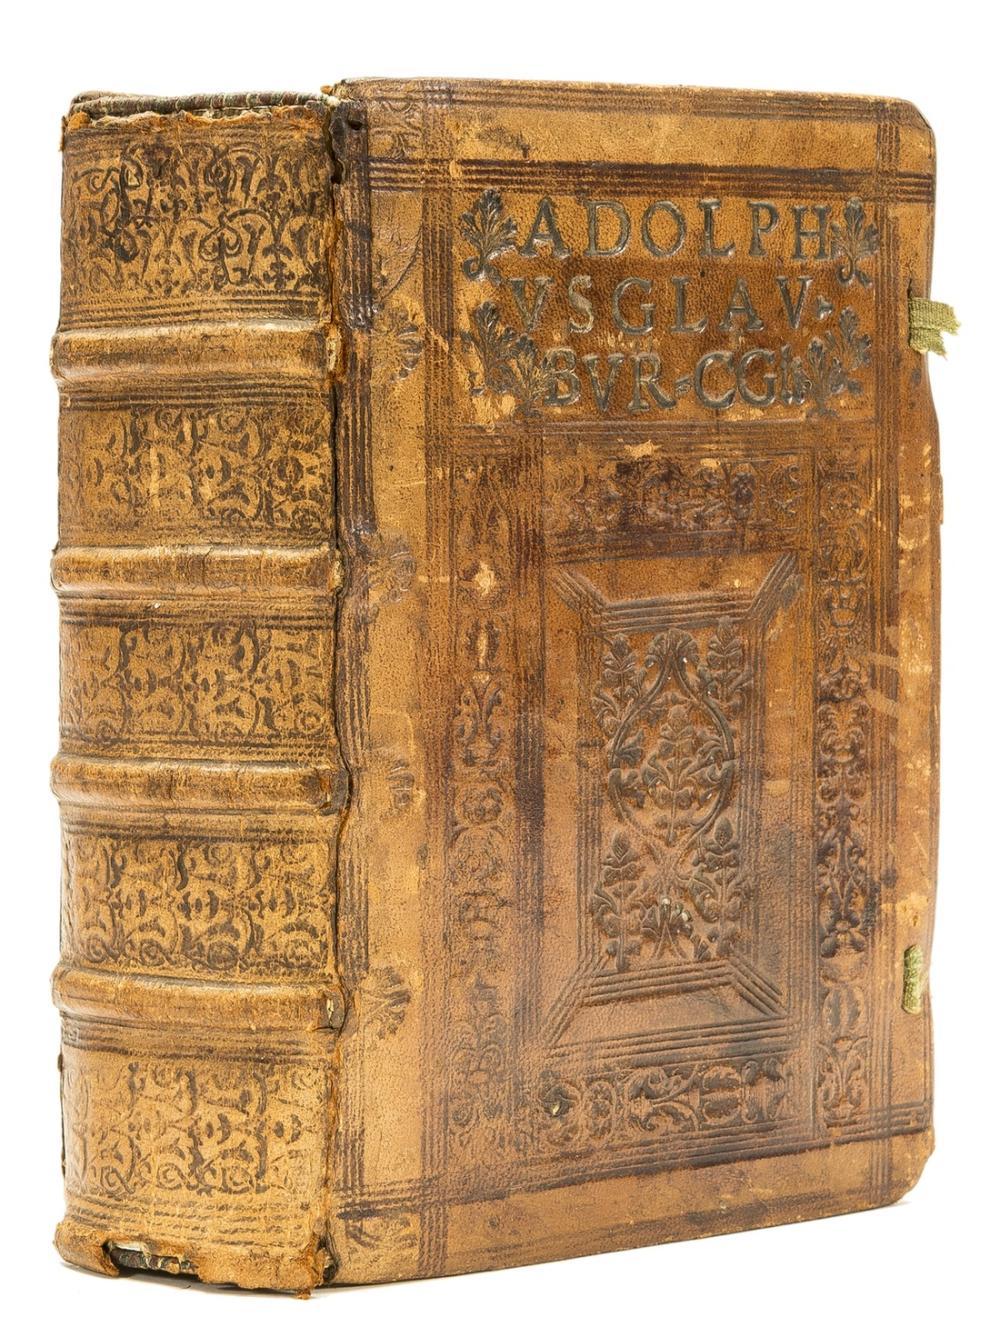 Binding.- Gryphius.- Quintilianus (Marcus Fabius) Institvtionvm oratoriarvm libri XII, in an interesting contemporary blind-stamped calf binding, Lyon, Sebastian Gryphius, 1536.